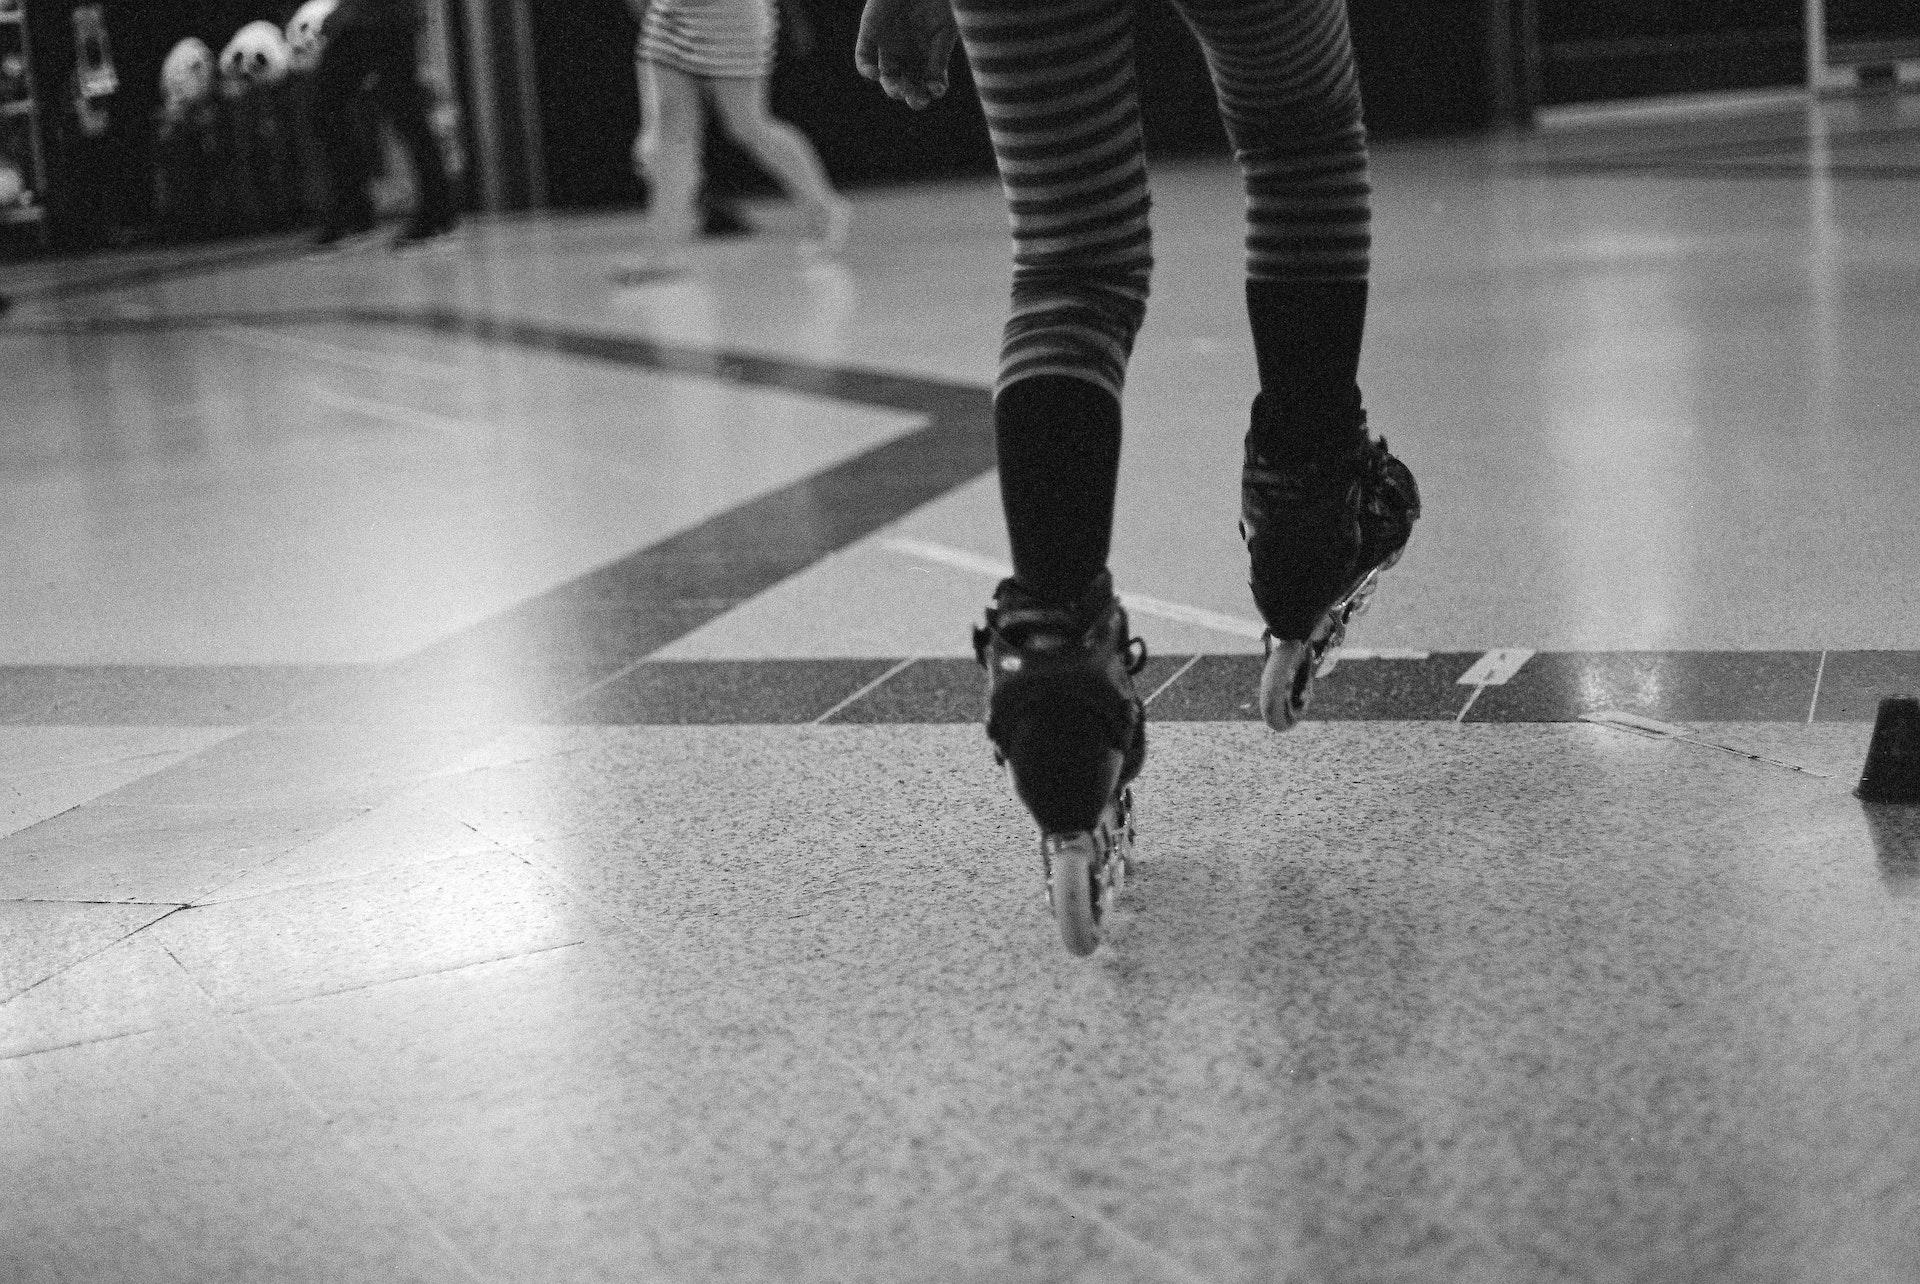 Stratford_Centre_Skaters_Lighter-11